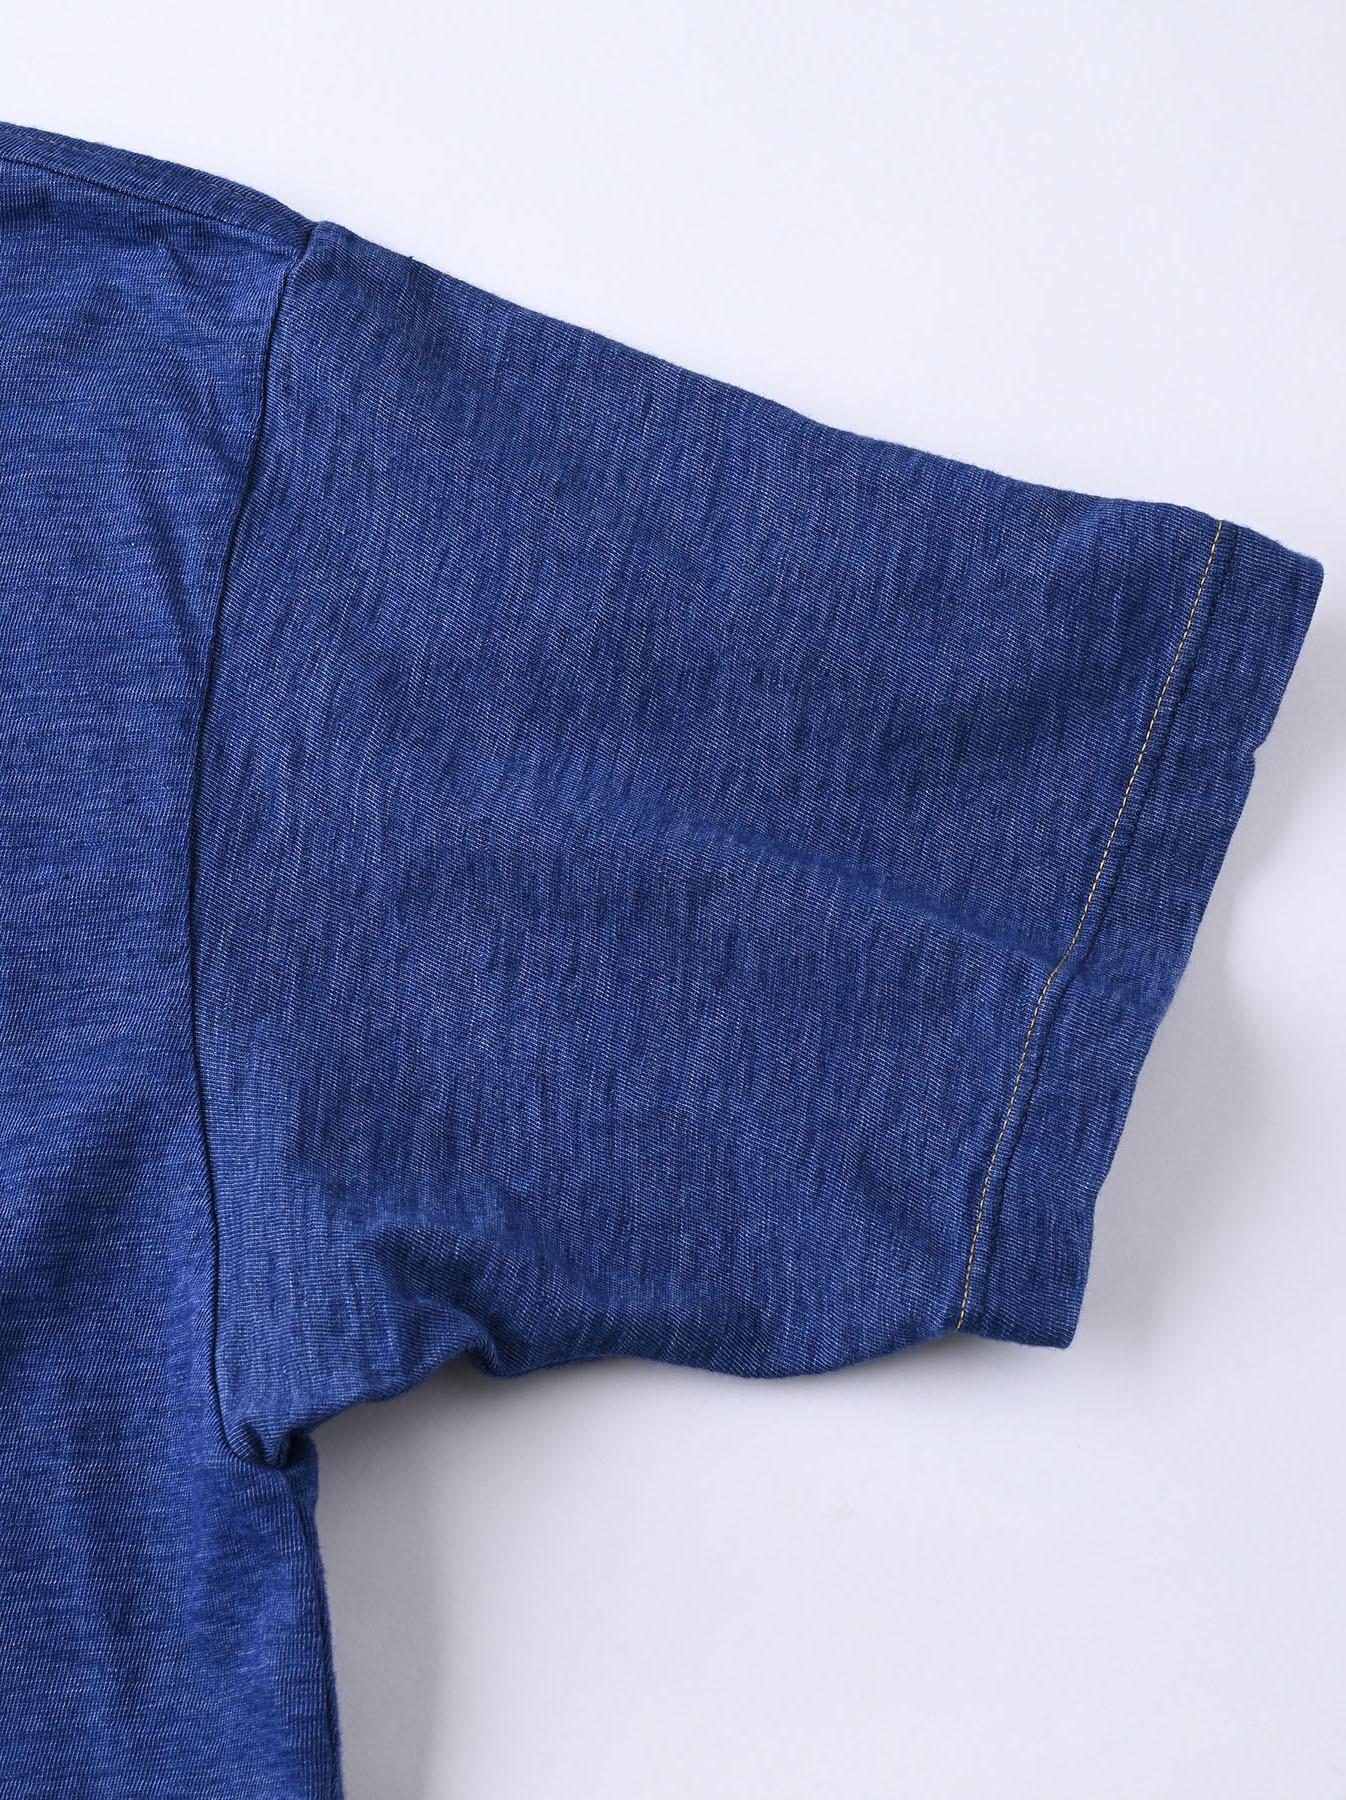 Distressed Indigo Ukiyo de Surf 908 Ocean T-shirt (0621)-11